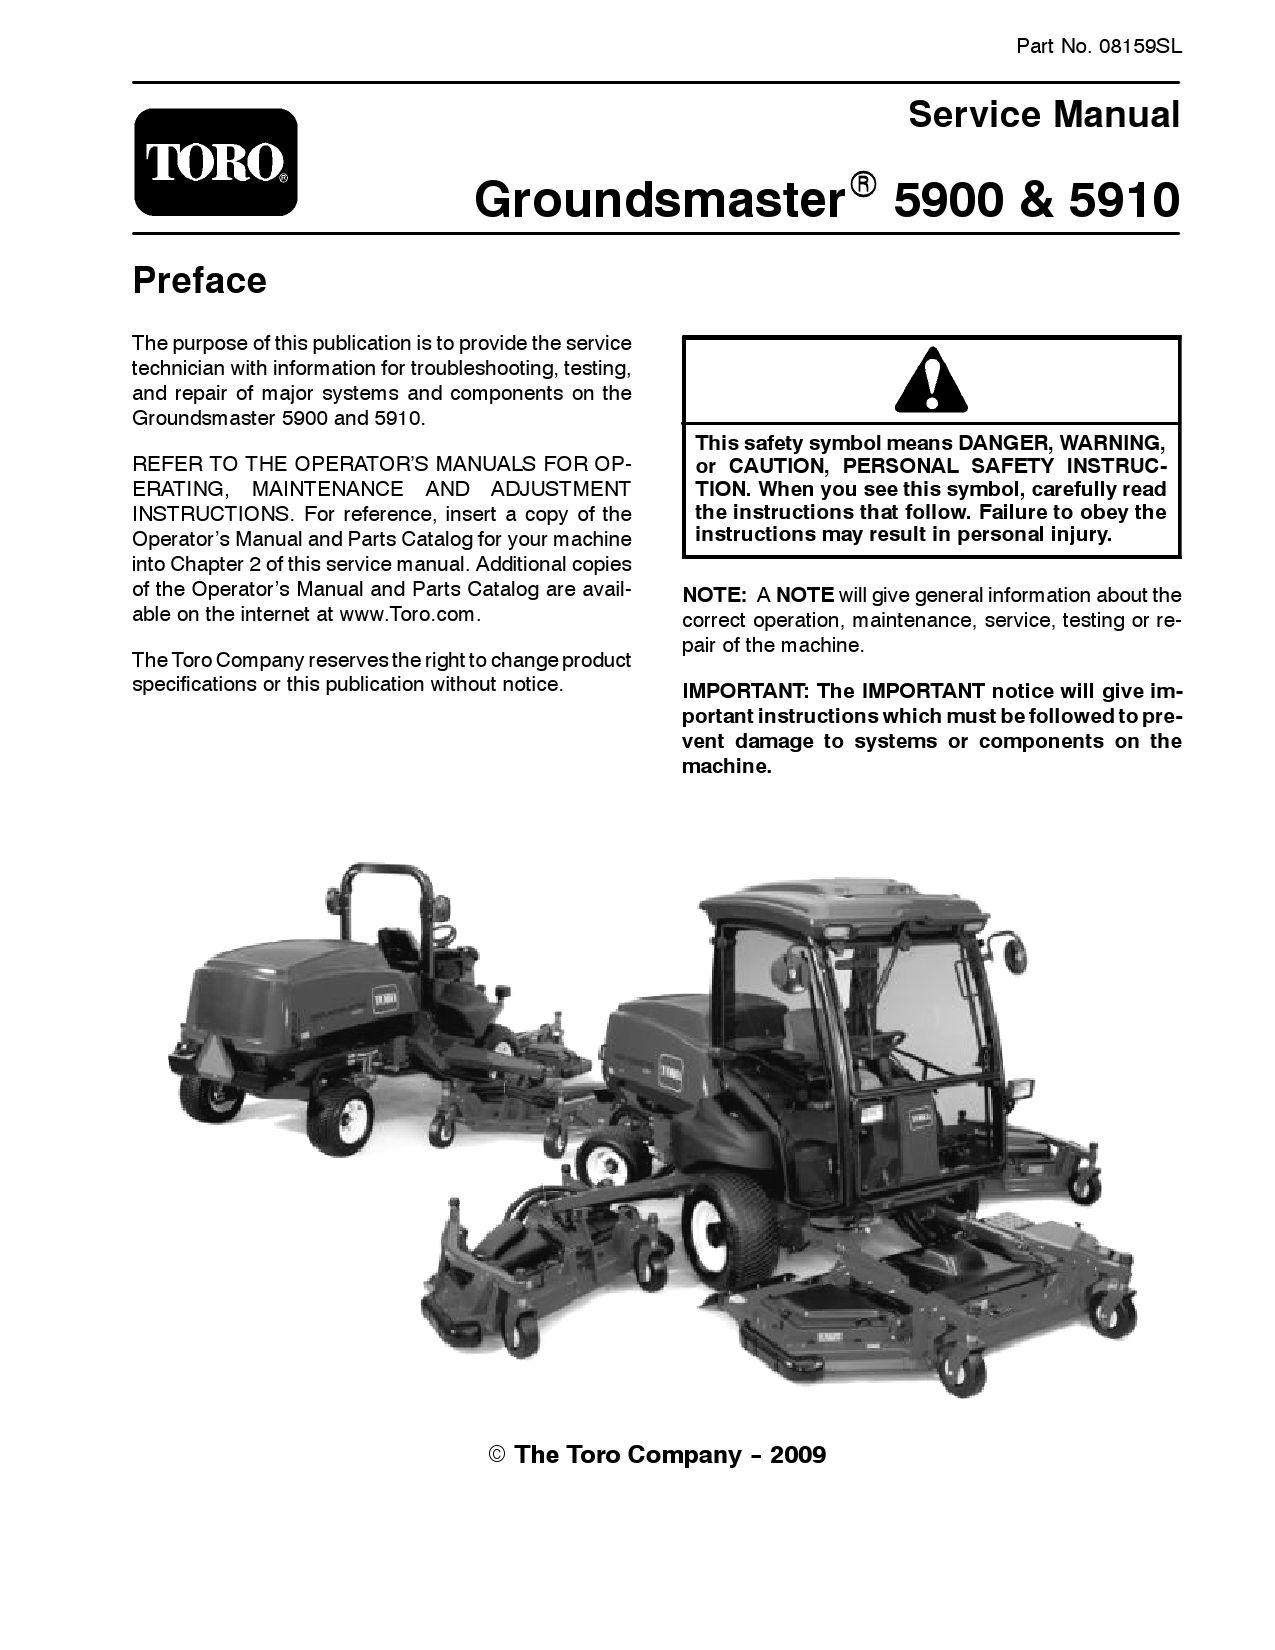 08159sl pdf Groundsmaster 5900/5910 Jan, 2009 NEW by